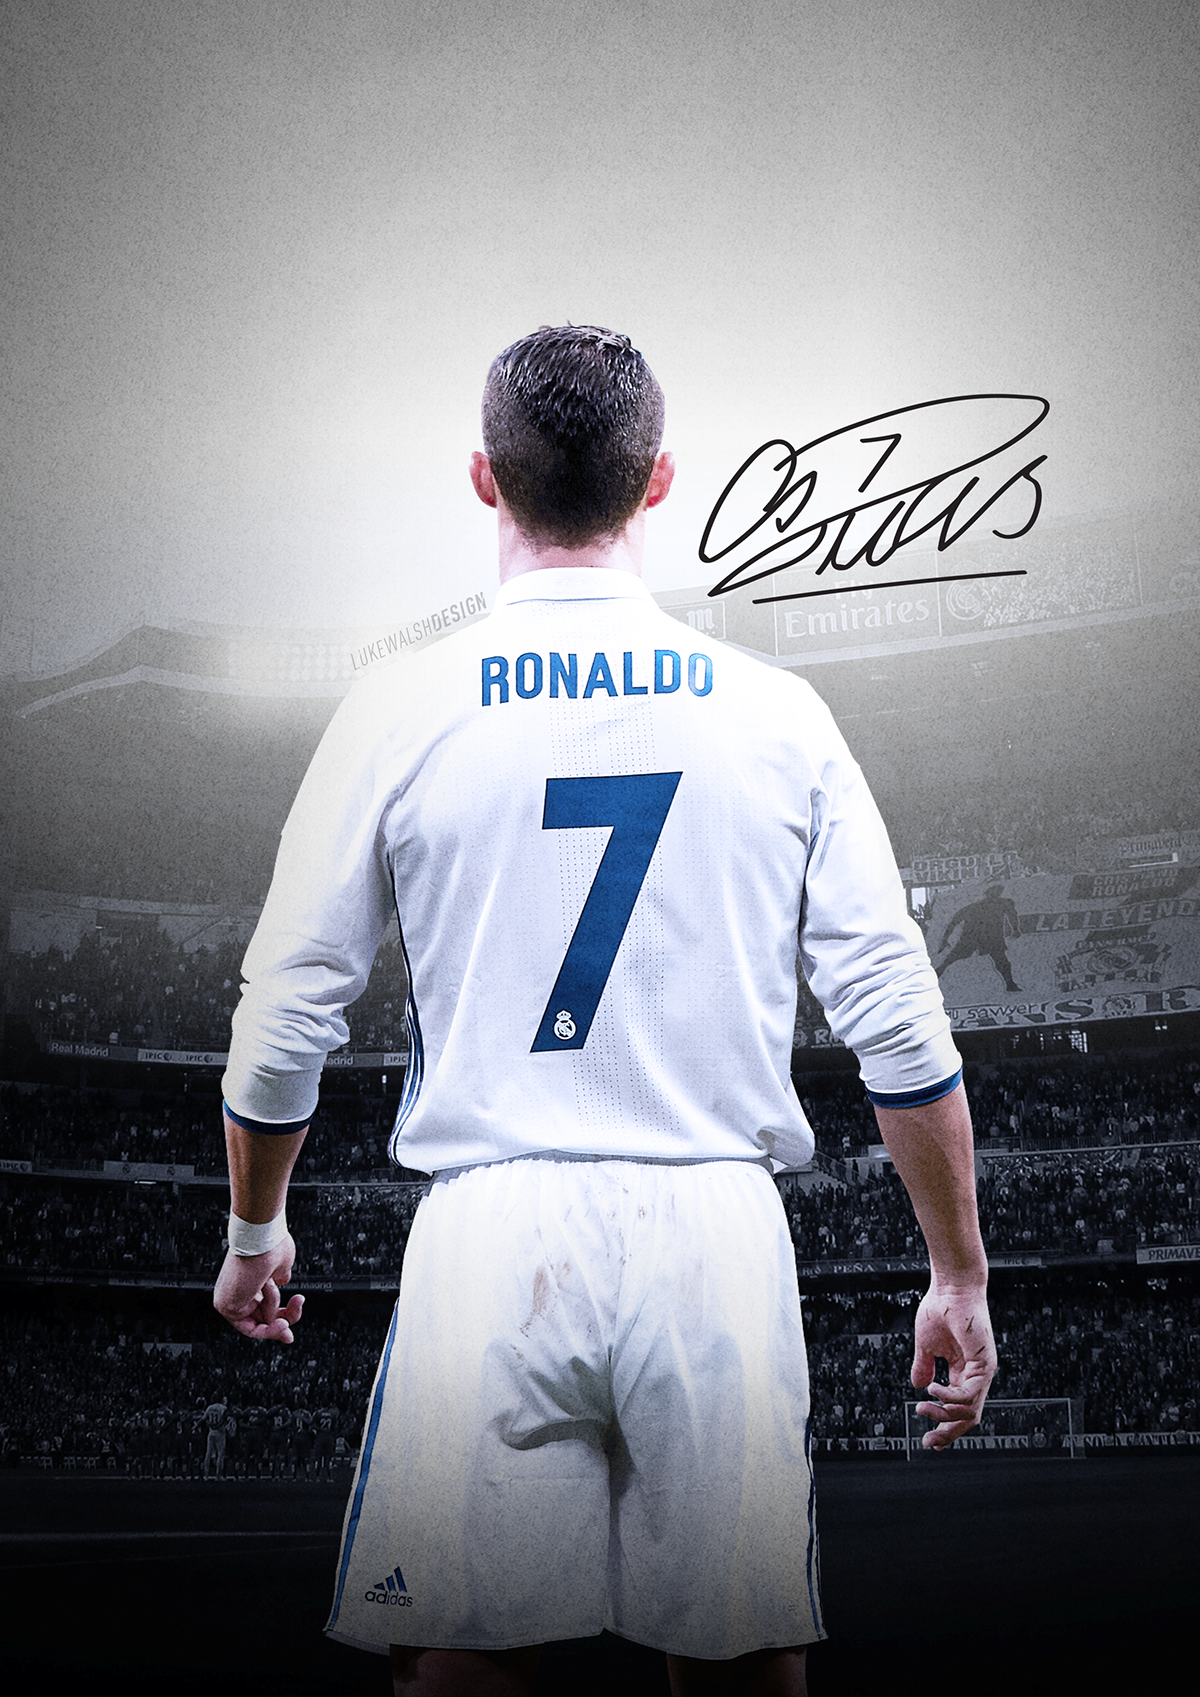 Ronaldo Signature : ronaldo, signature, Cristiano, Ronaldo, Poster, Walsh, Signature, Series, Season, Behance, Ronaldo,, Signature,, Cristoano